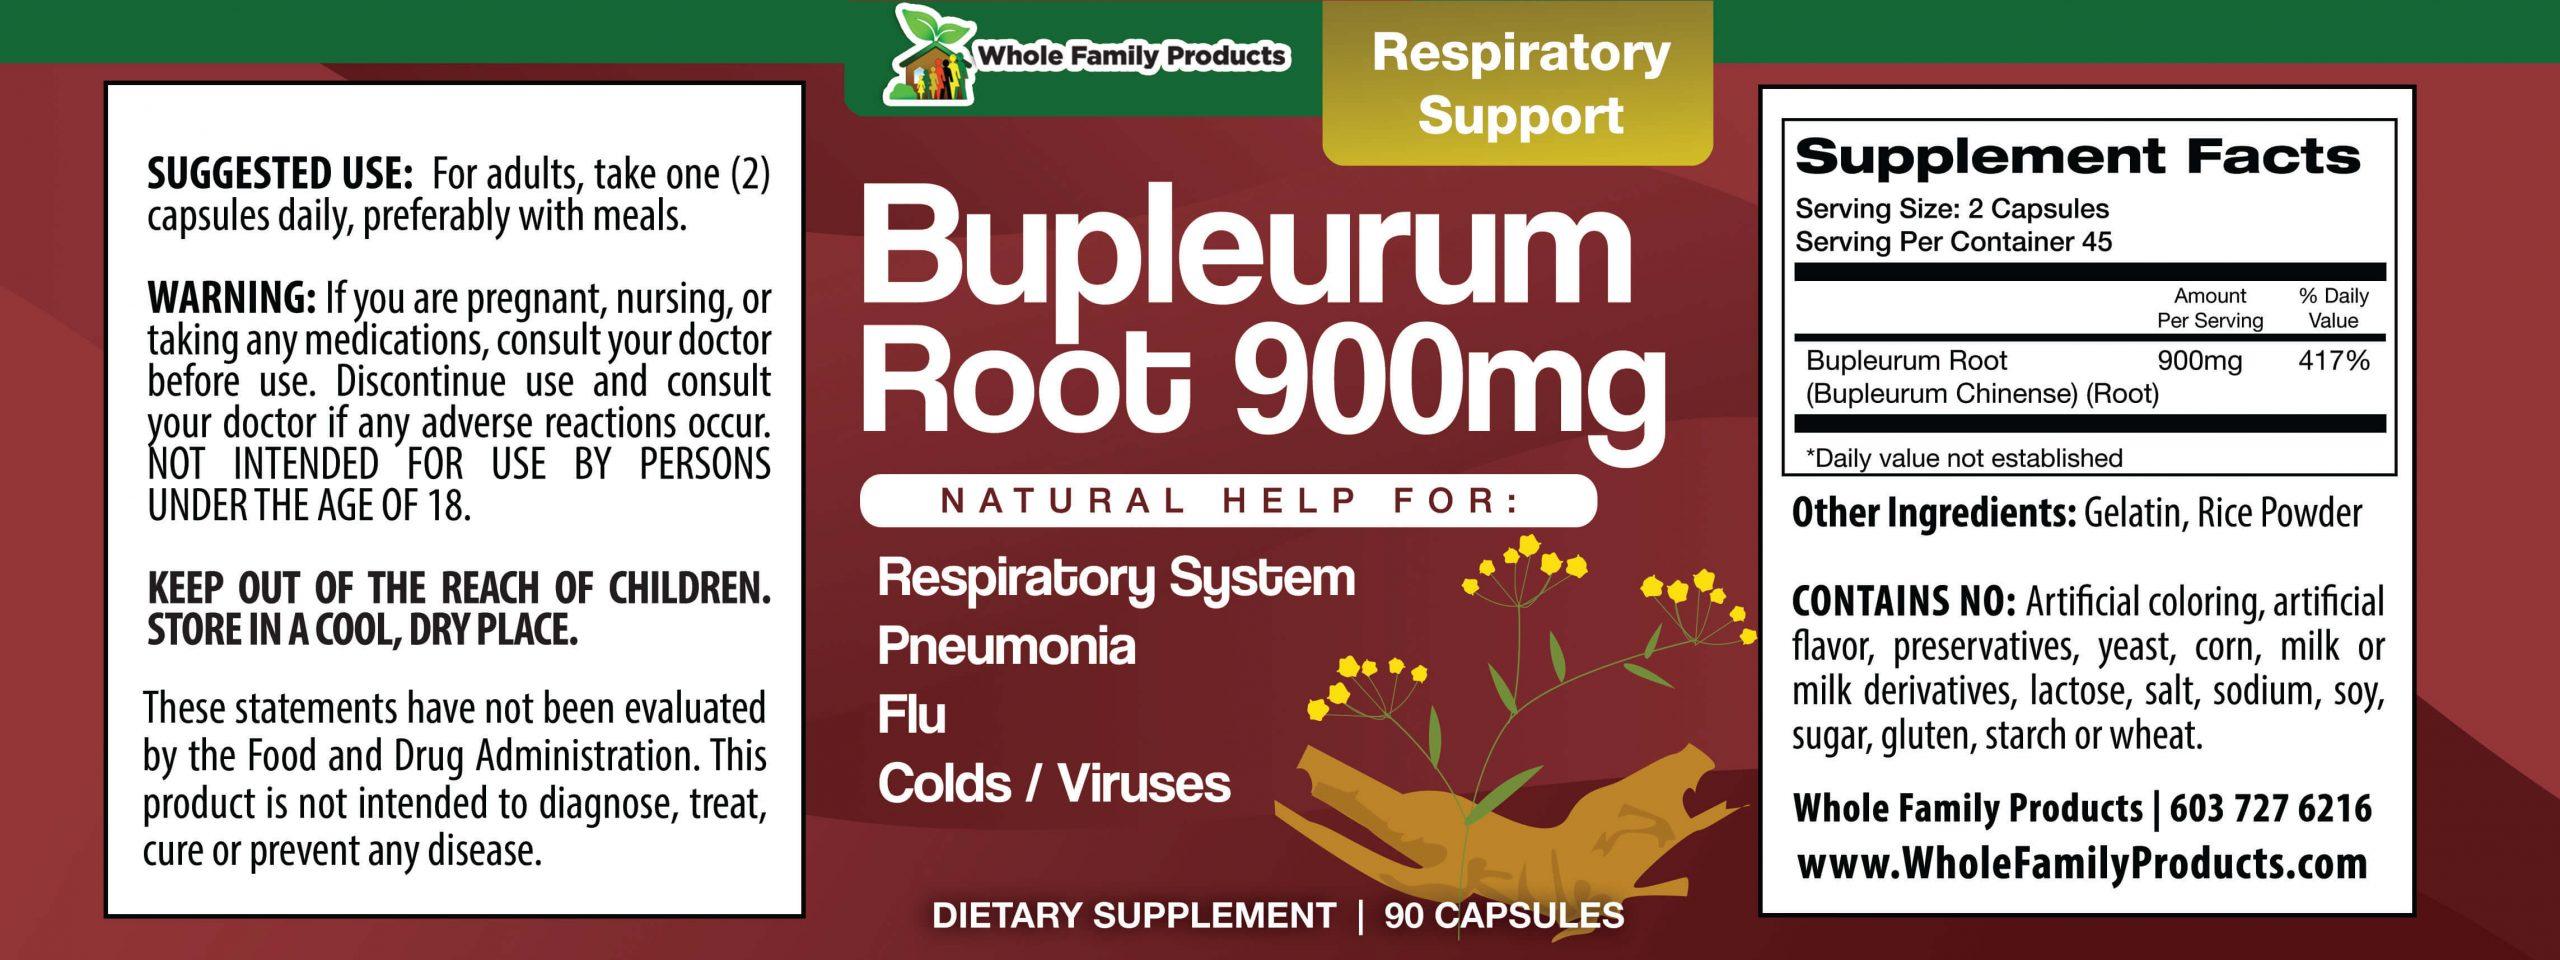 Bupleurum Root 900mg 90 Capsules WFP Product Label